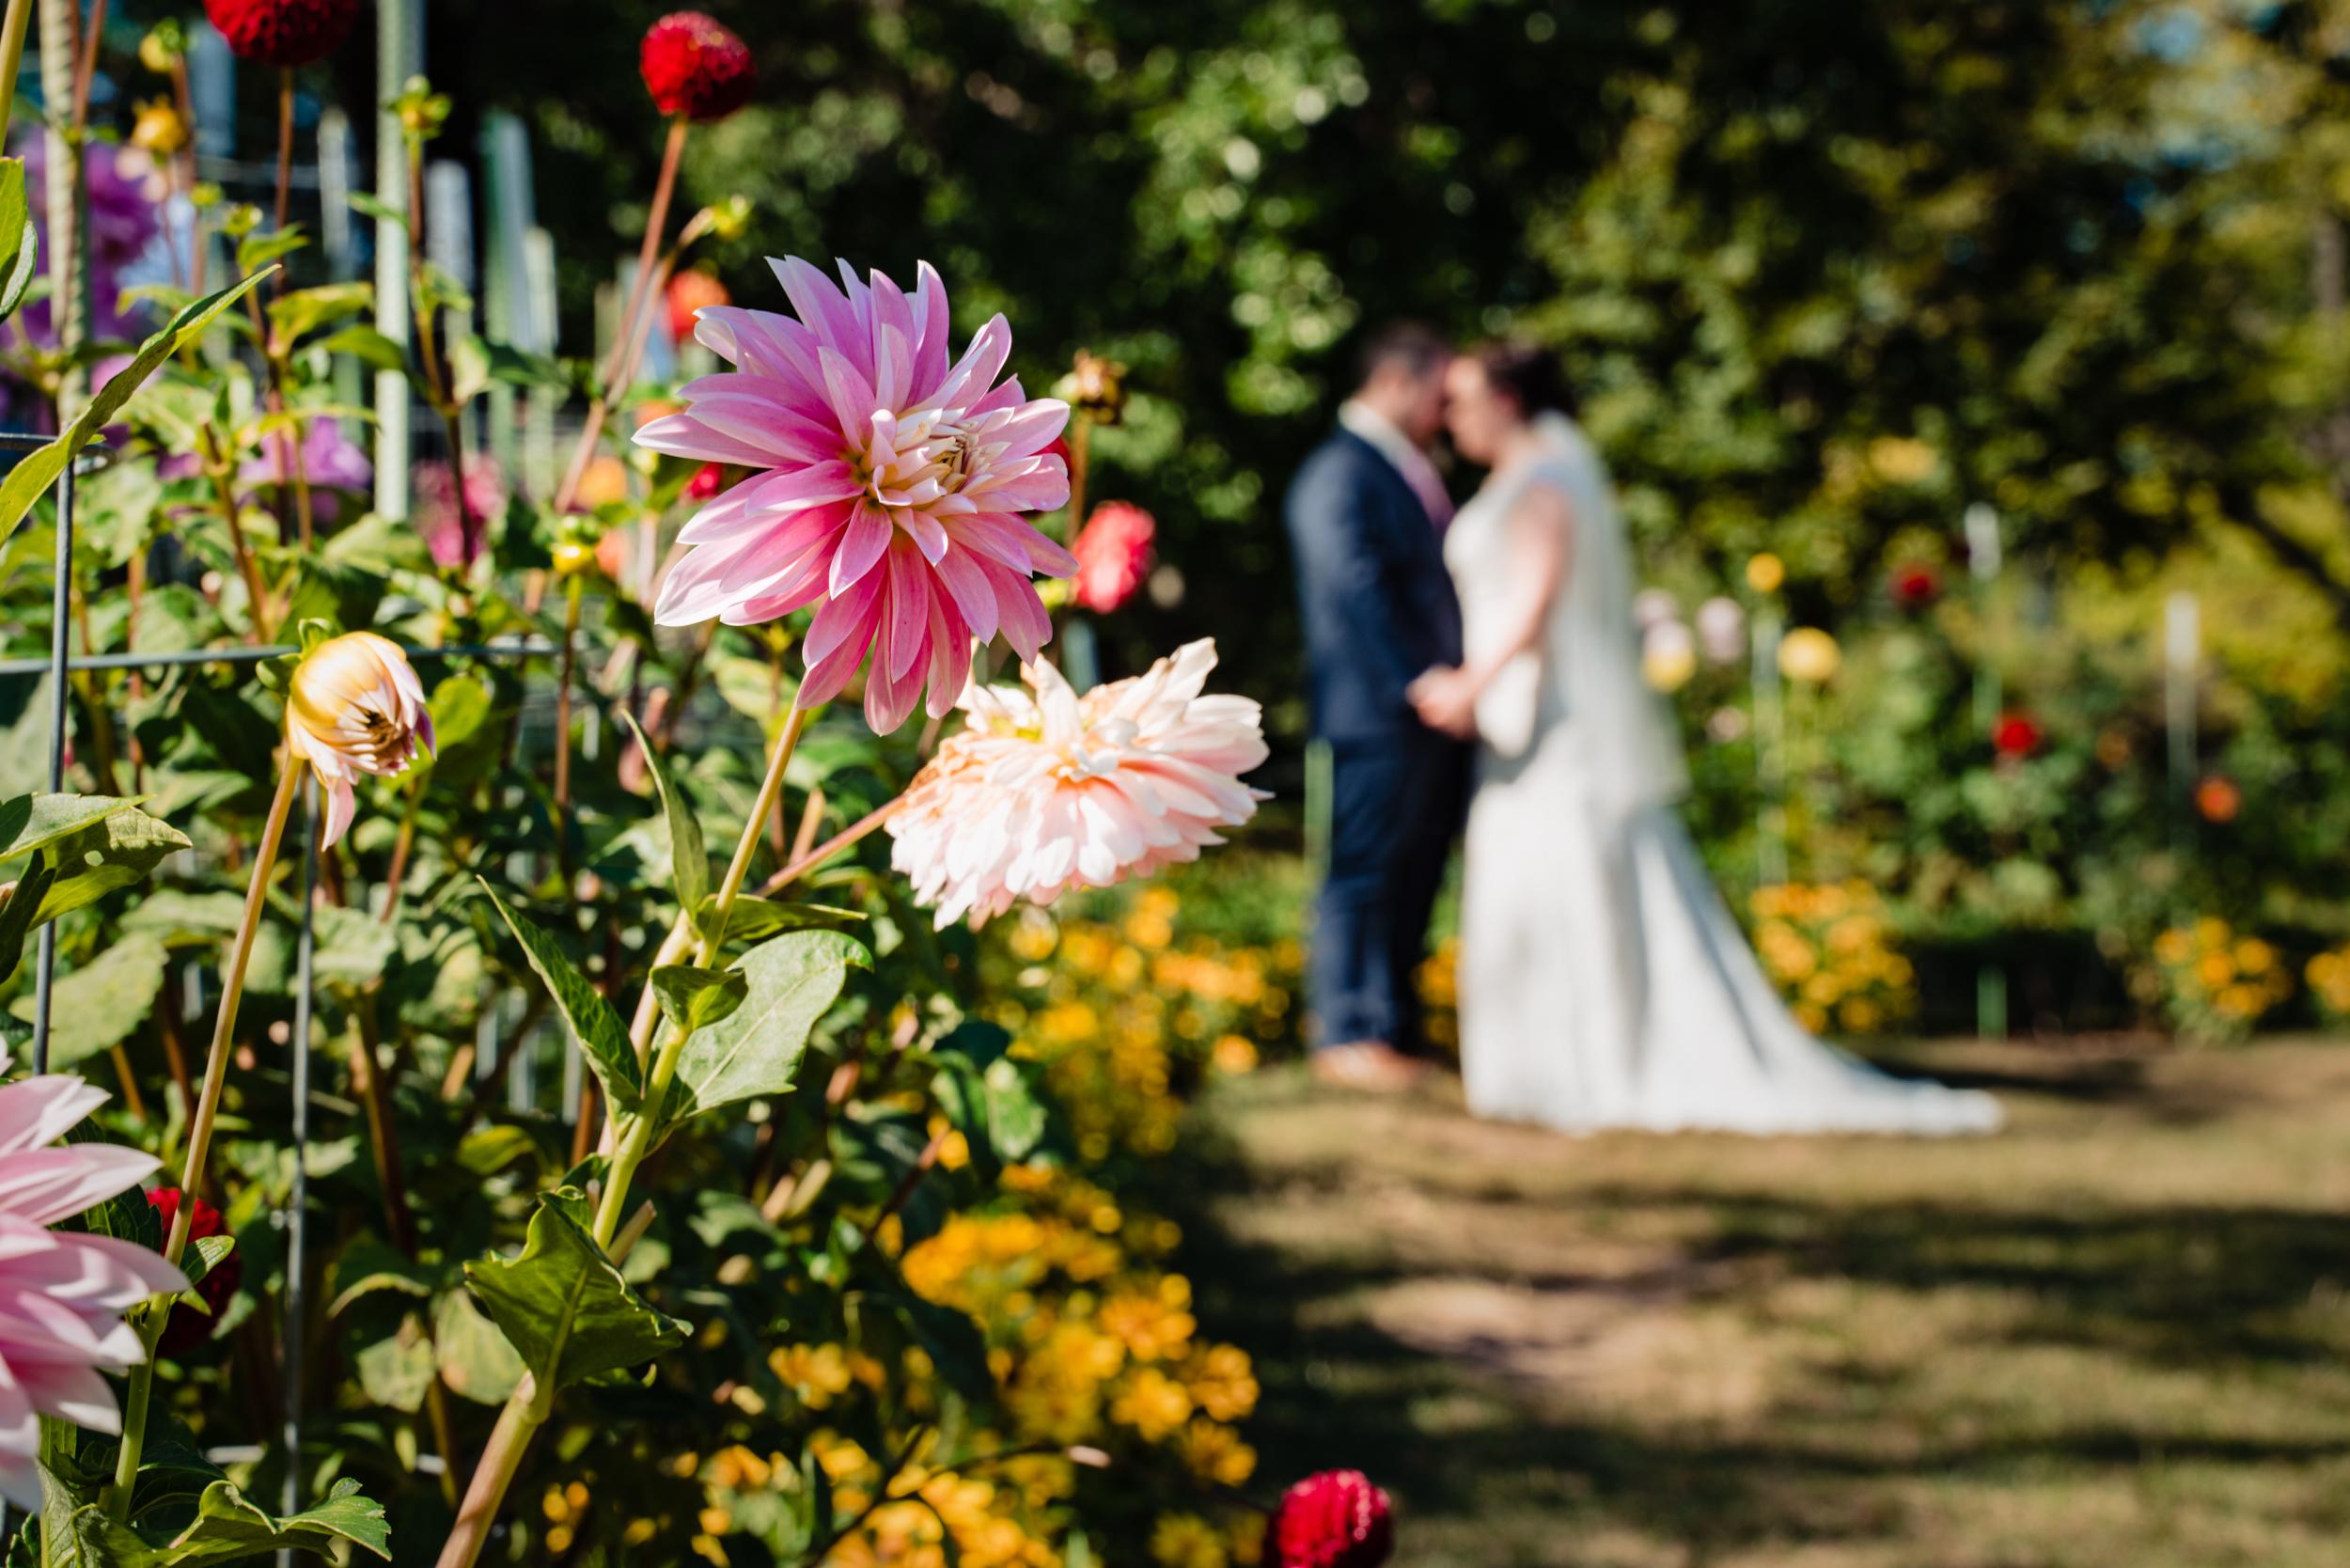 Halifax-wedding-photography-fall-photographers-novascotia-canada-ottawa (67 of 113).jpg